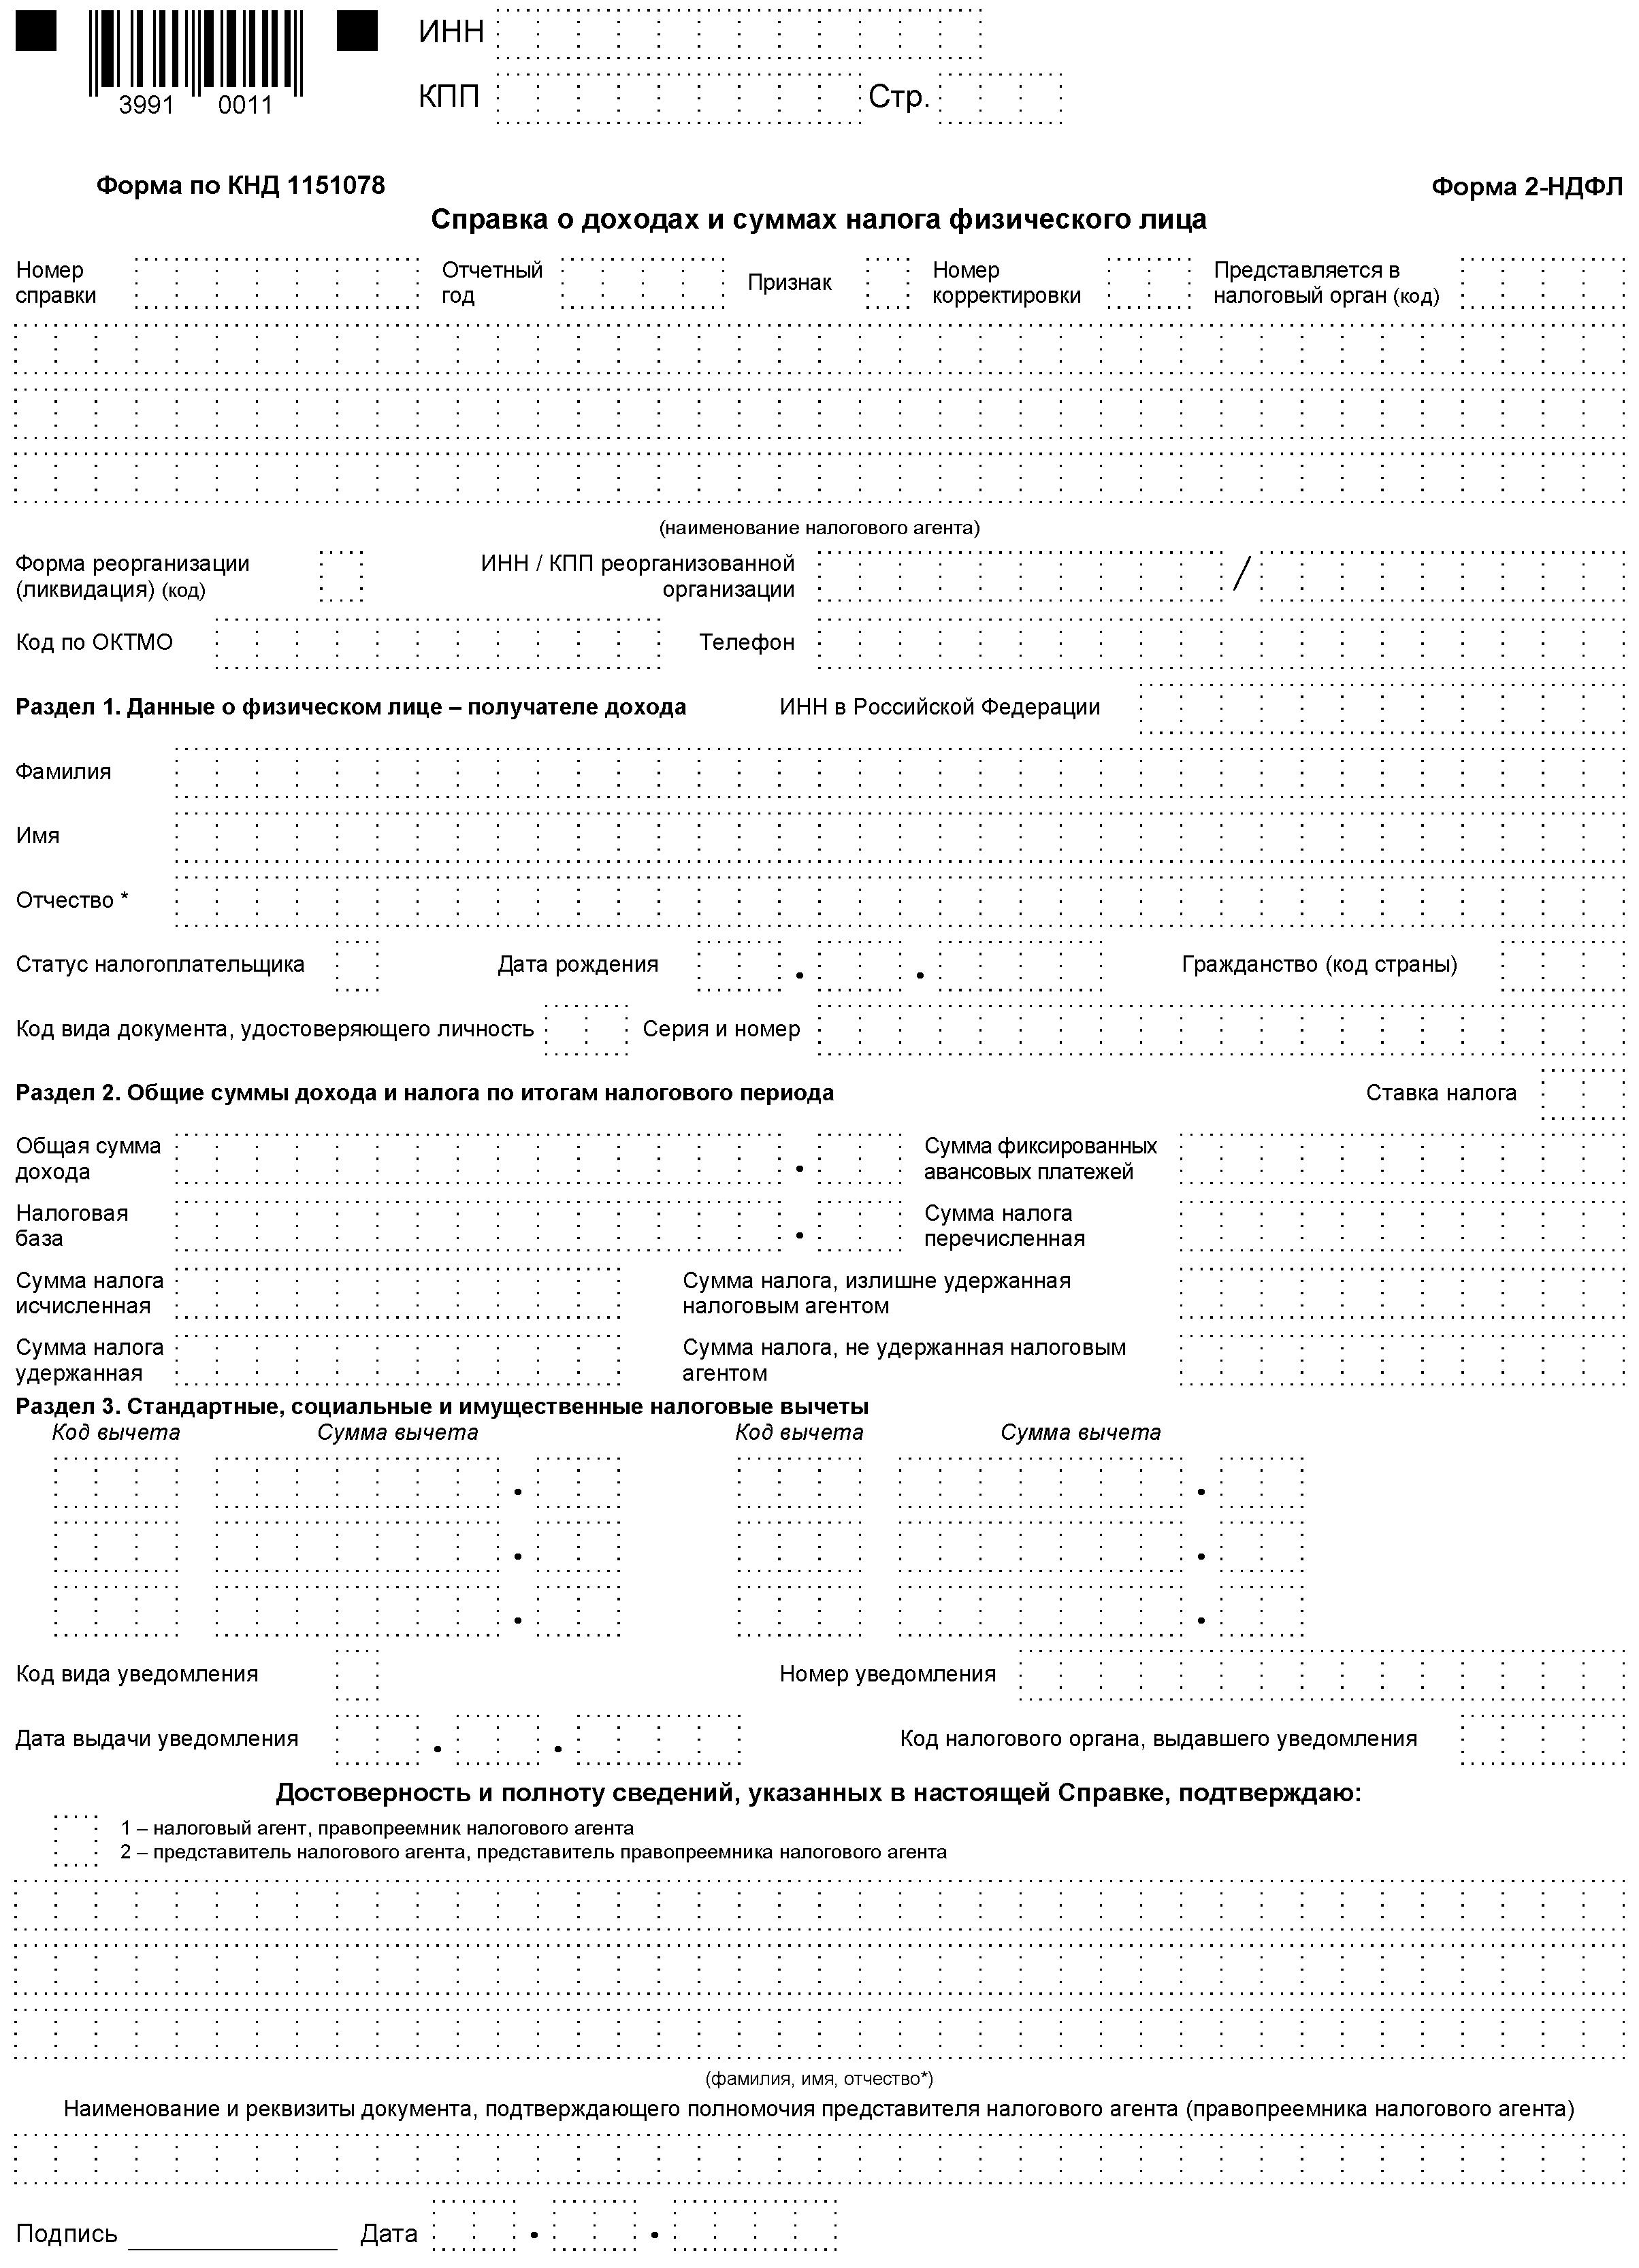 Объединение форм 6-НДФЛ и 2-НДФЛ